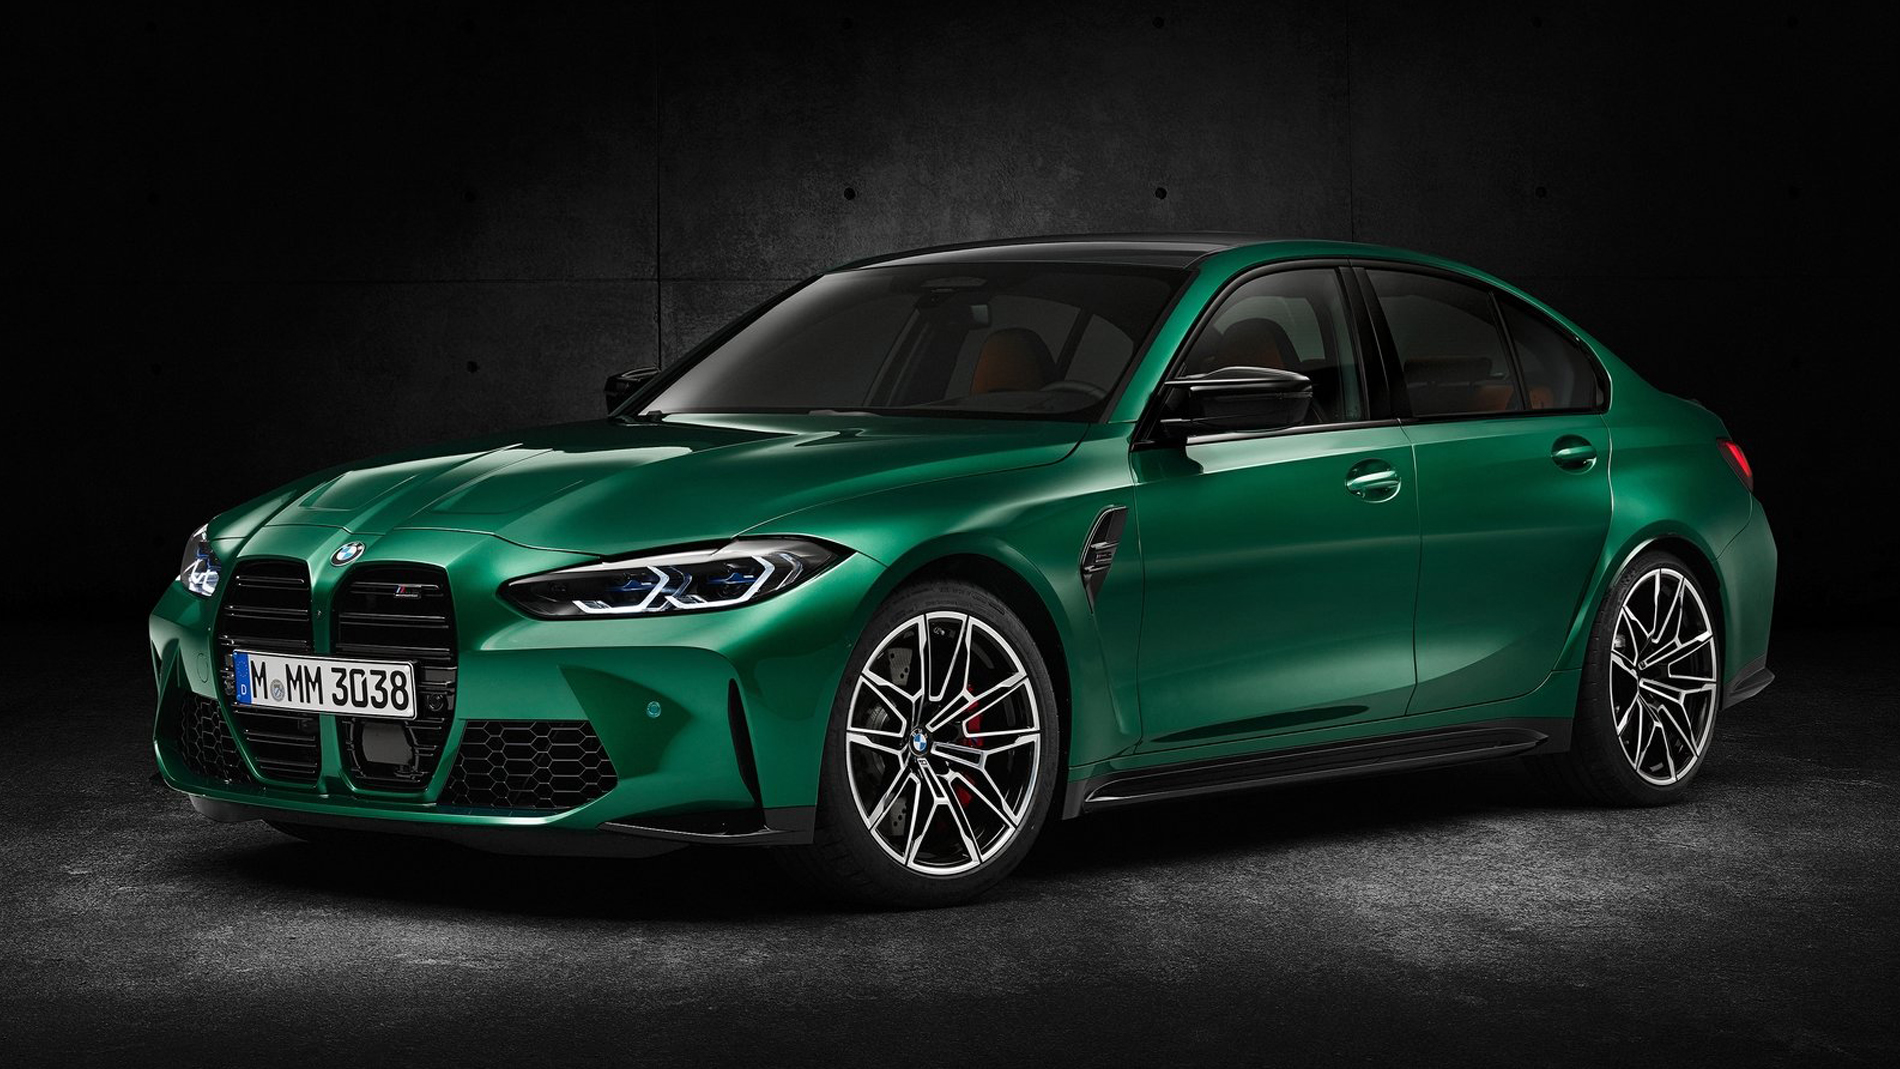 wp_m3_0002_BMW-M3_Sedan_Competition-2021-1600-45